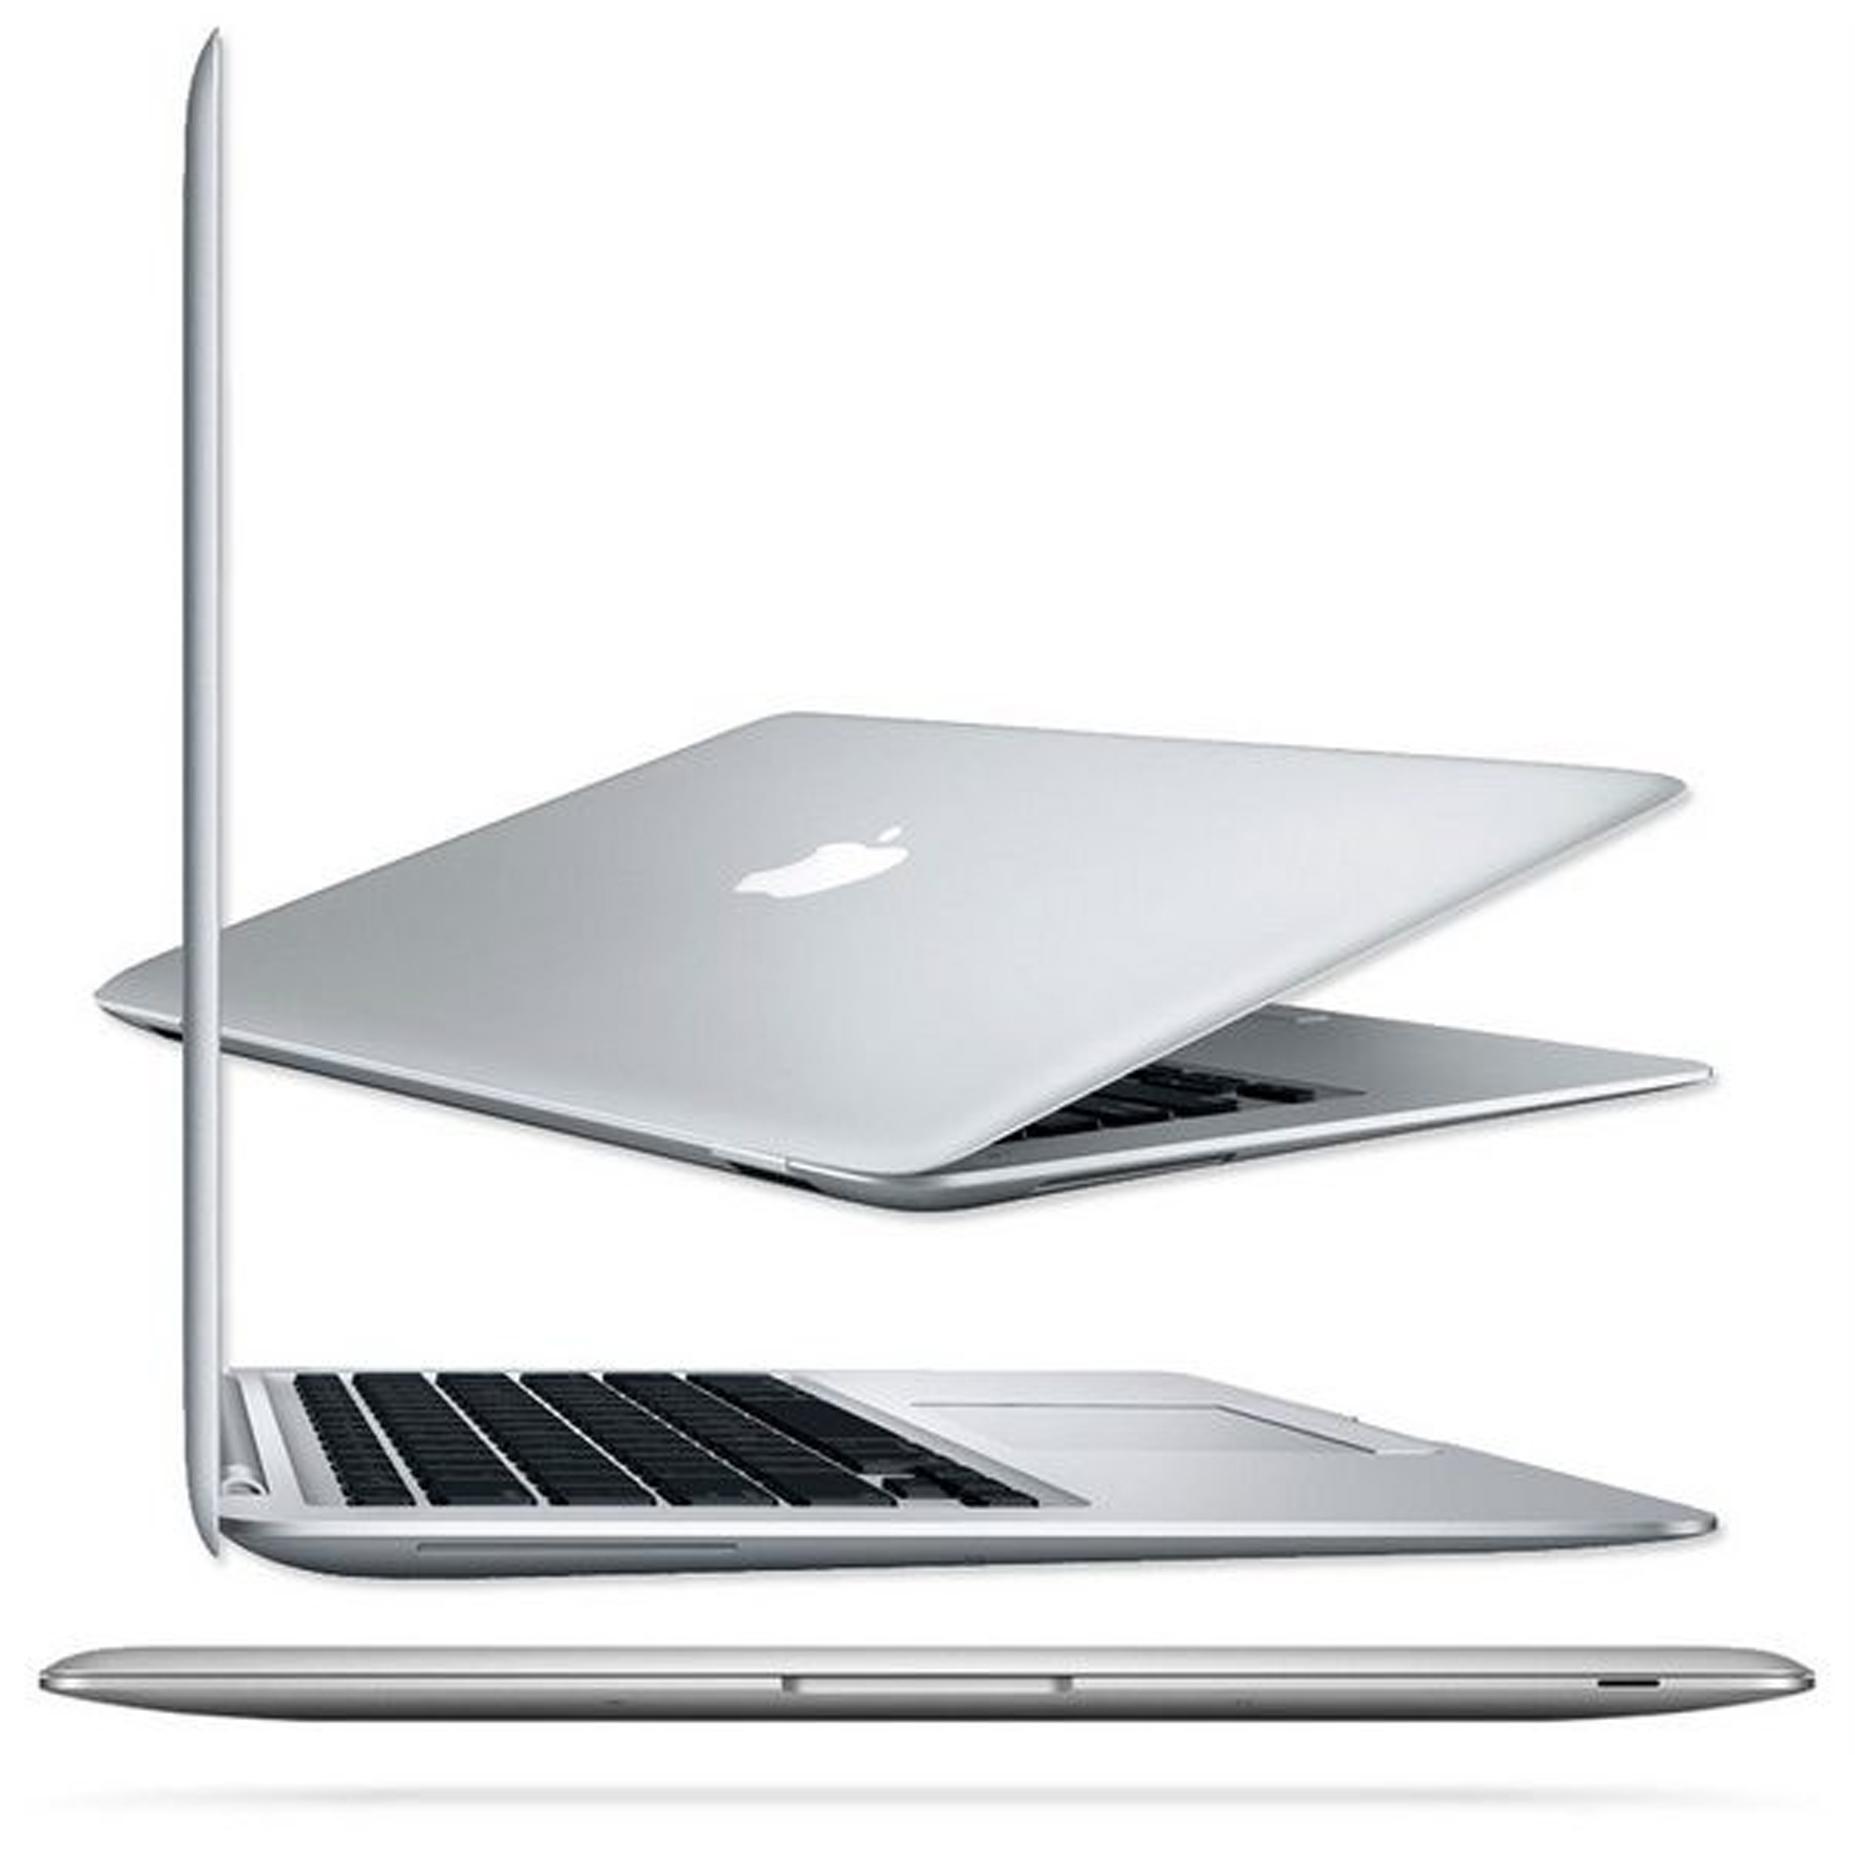 Jual Harga Apple Macbook Air Mc968 Mouse Wireless No Merk Lenovo Asus Toshiba Acer Info Lainnya